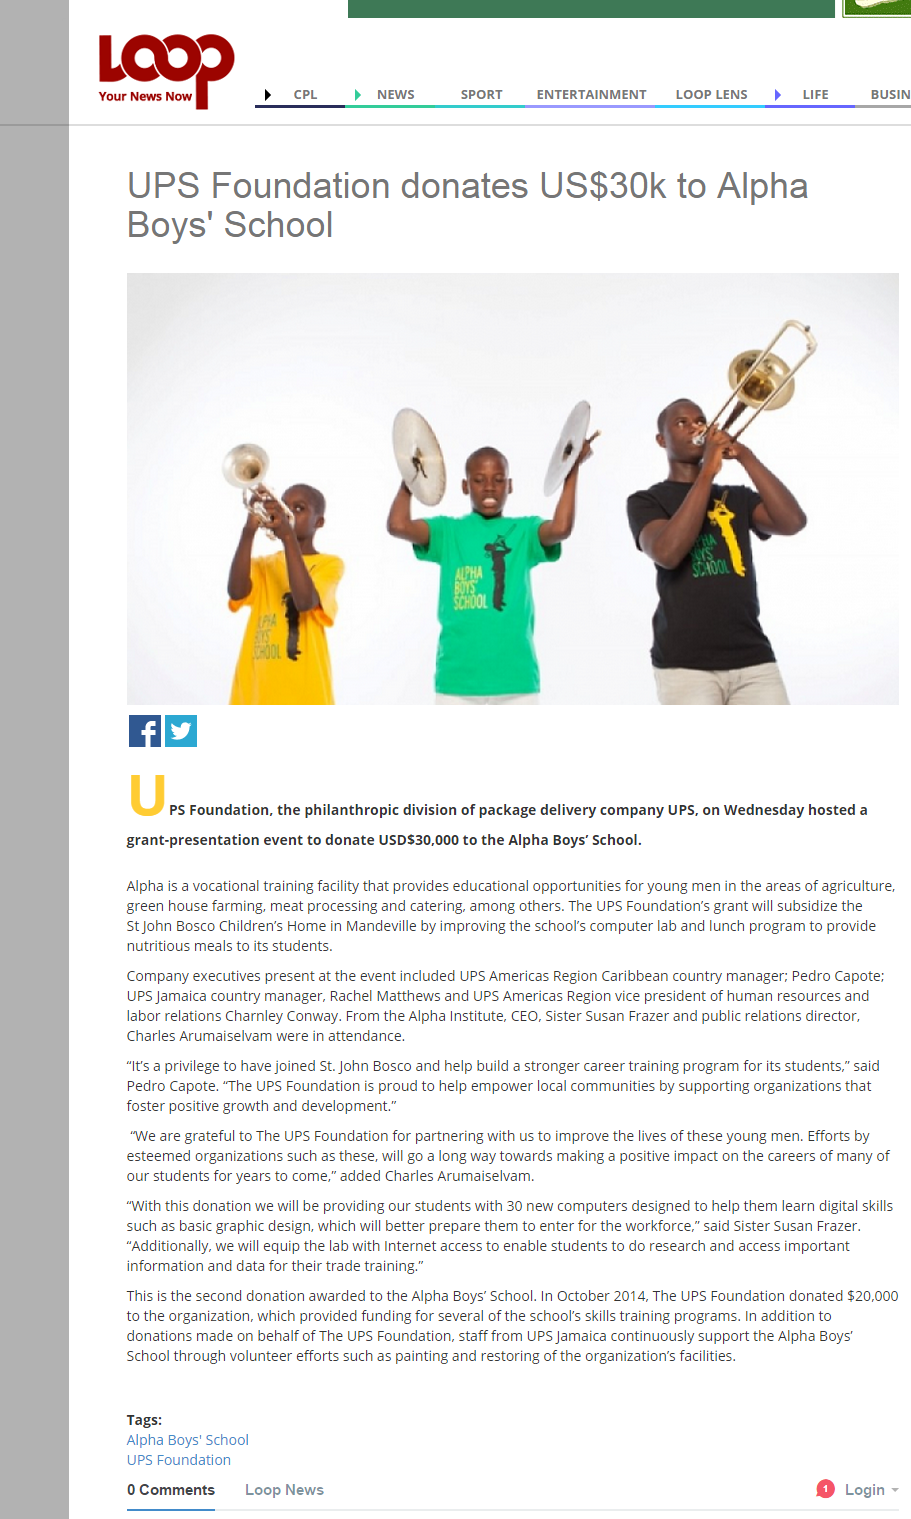 UPS Foundation donates US$30k to Alpha Boys' School